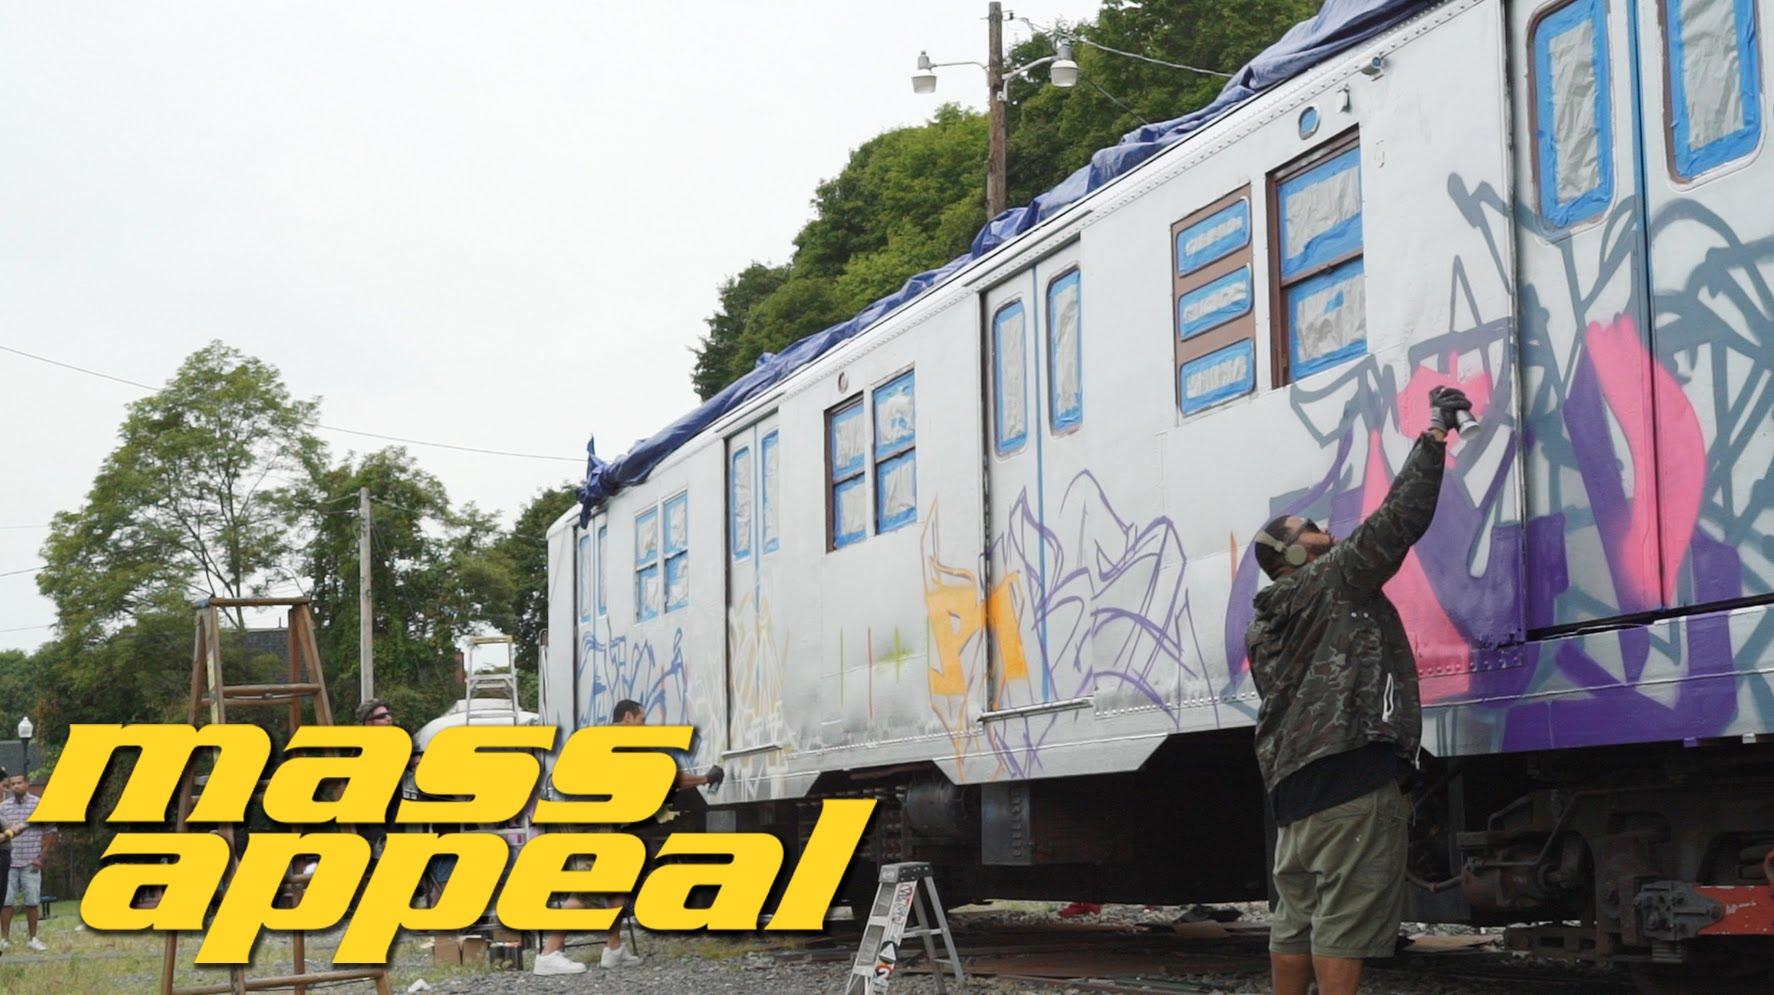 #Graffiti – The Burning of Kingston